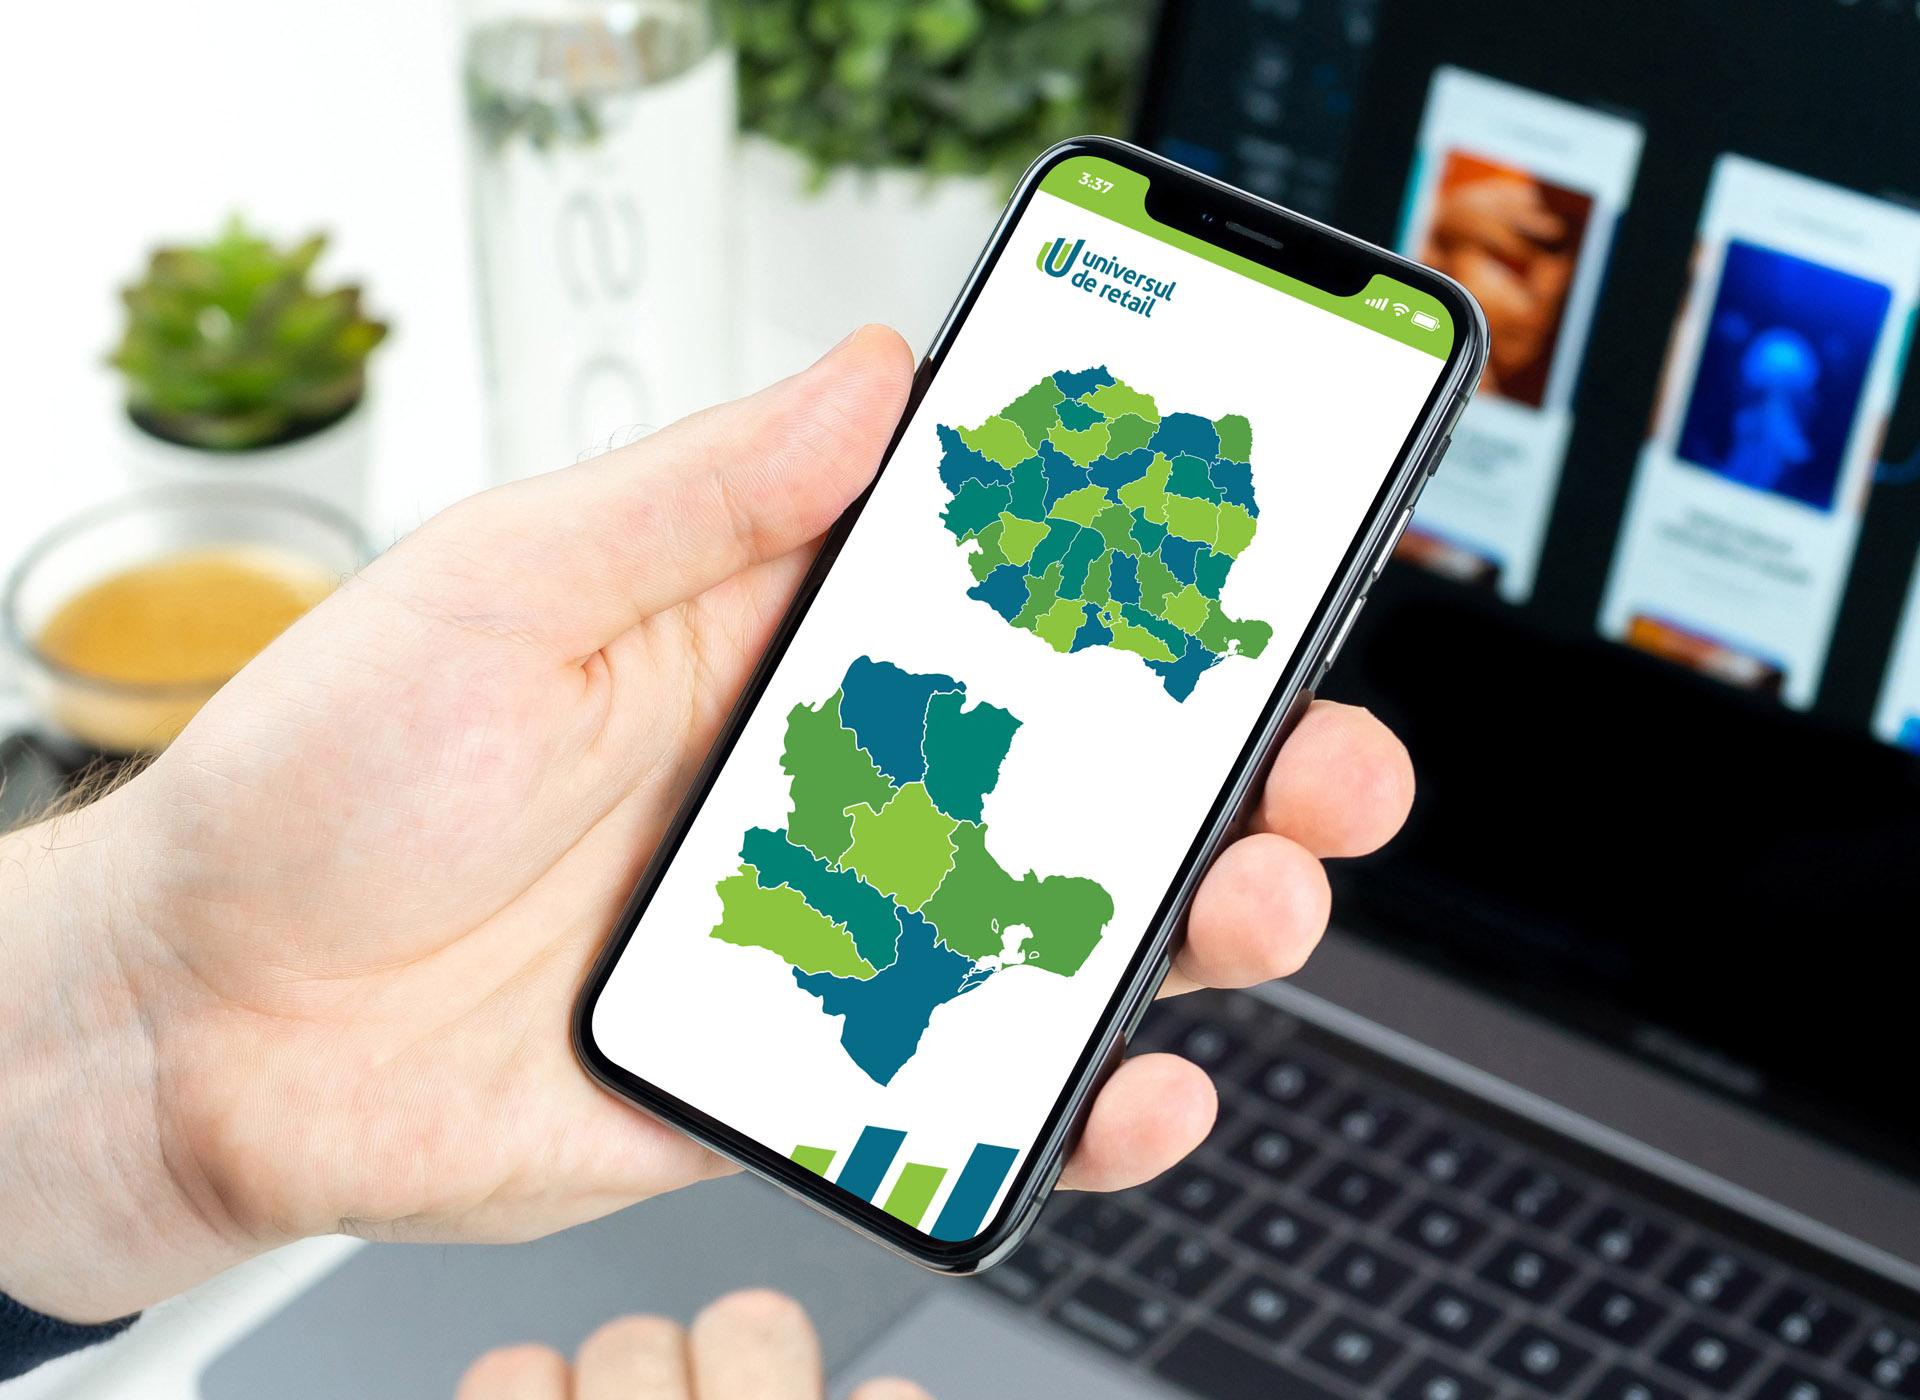 universul de retail portofoliu inoveo mobile app map